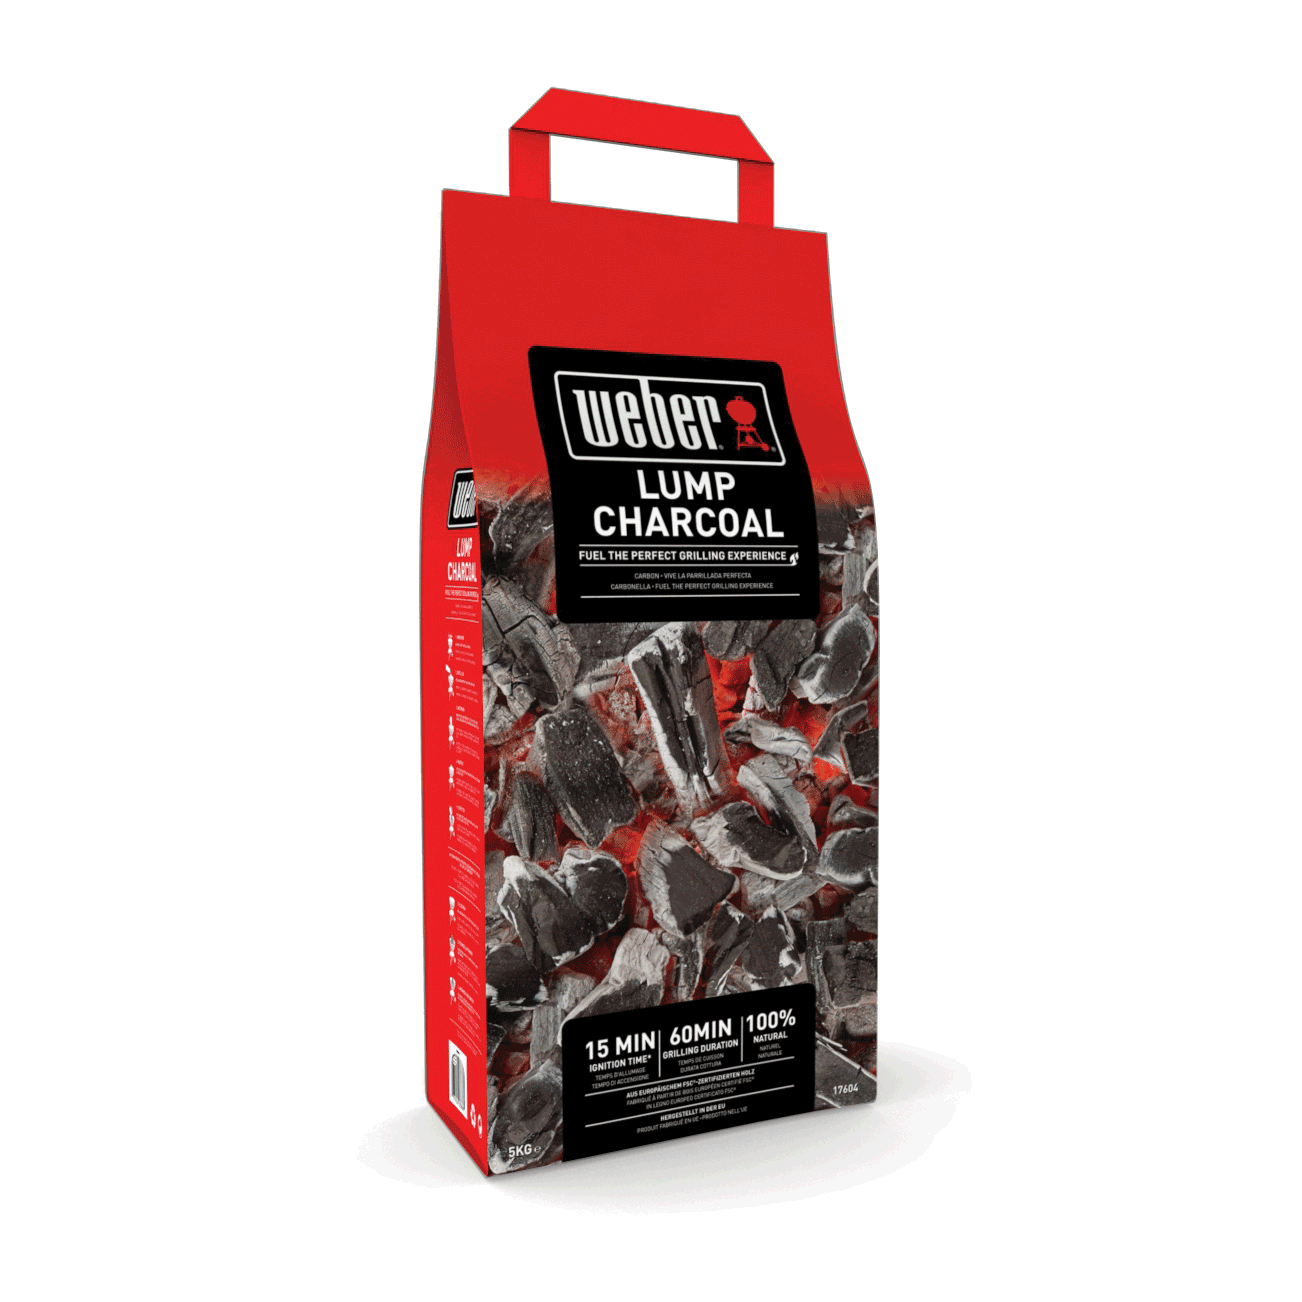 5kg bag of weber lumpwood charcoal